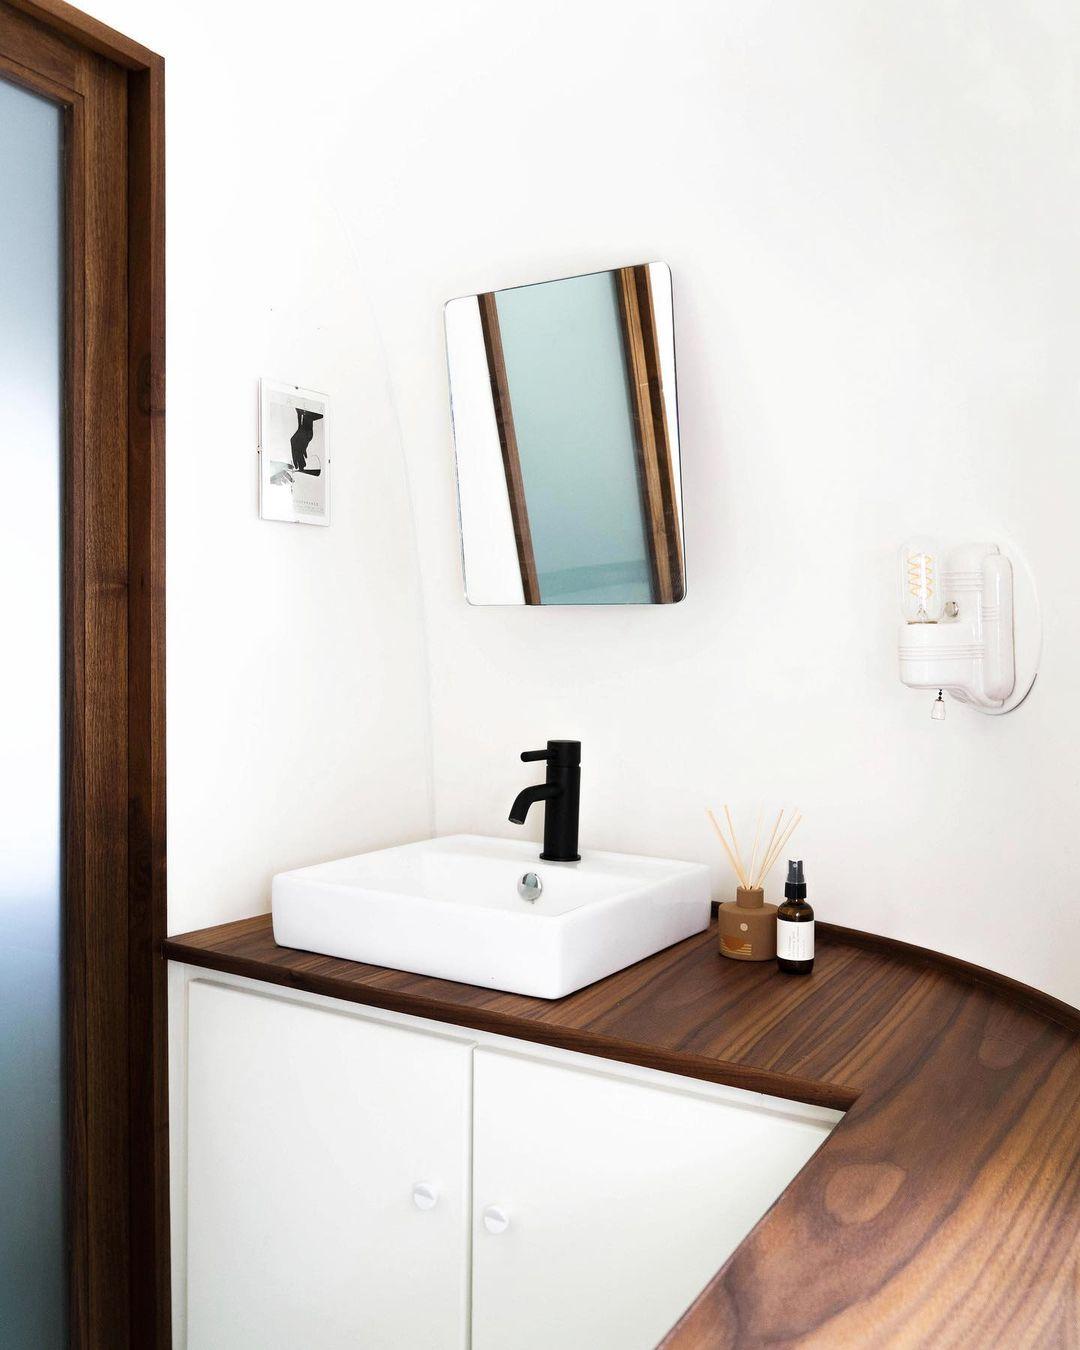 Airstream trailer Haus 8 - Interior designer turned heirloom Airstream into delightful home